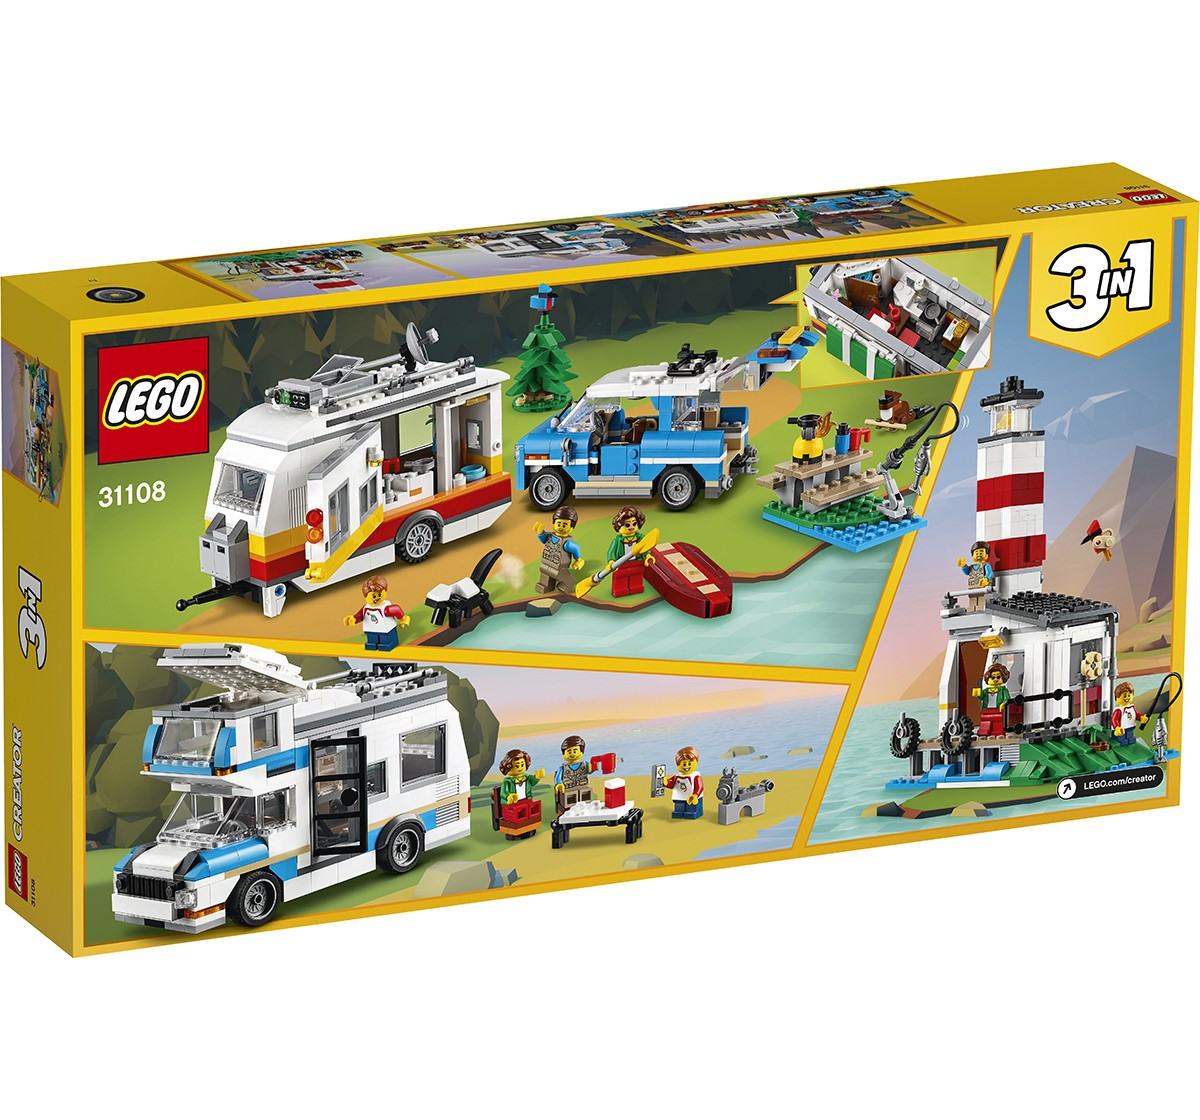 LEGO Caravan Family Holiday Lego Blocks for Kids age 8Y+